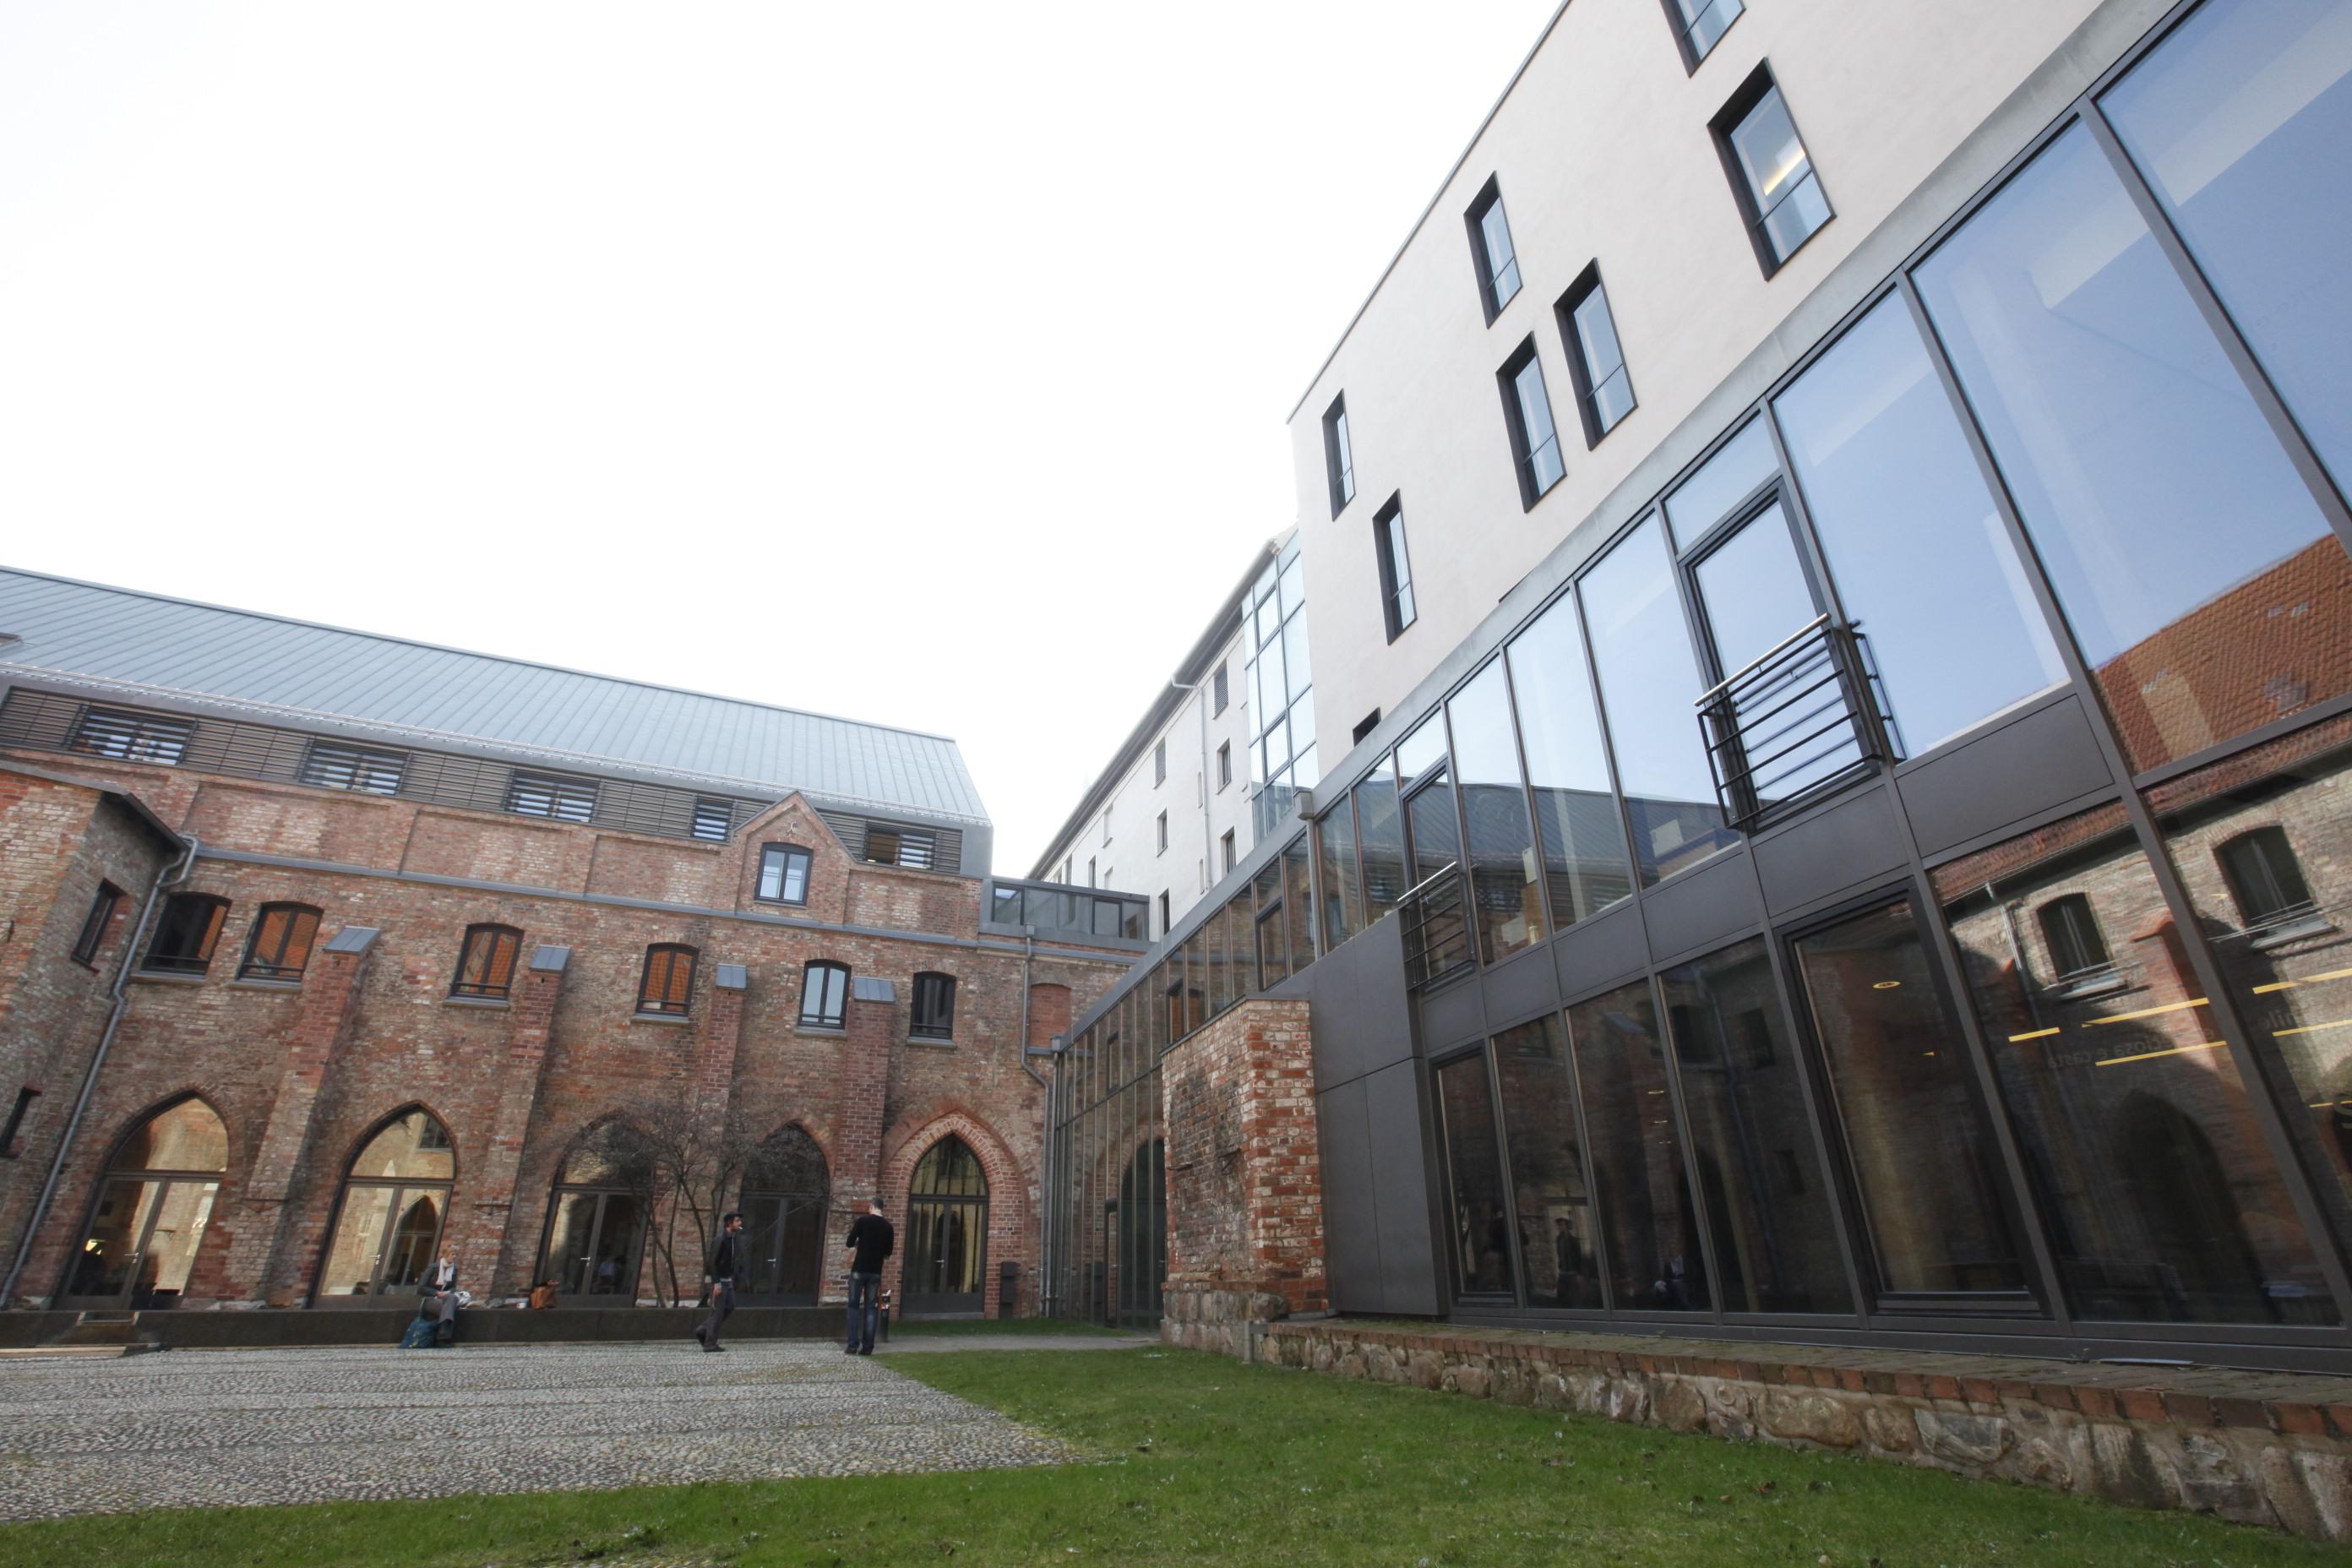 Hmt Rostock Bibliothek